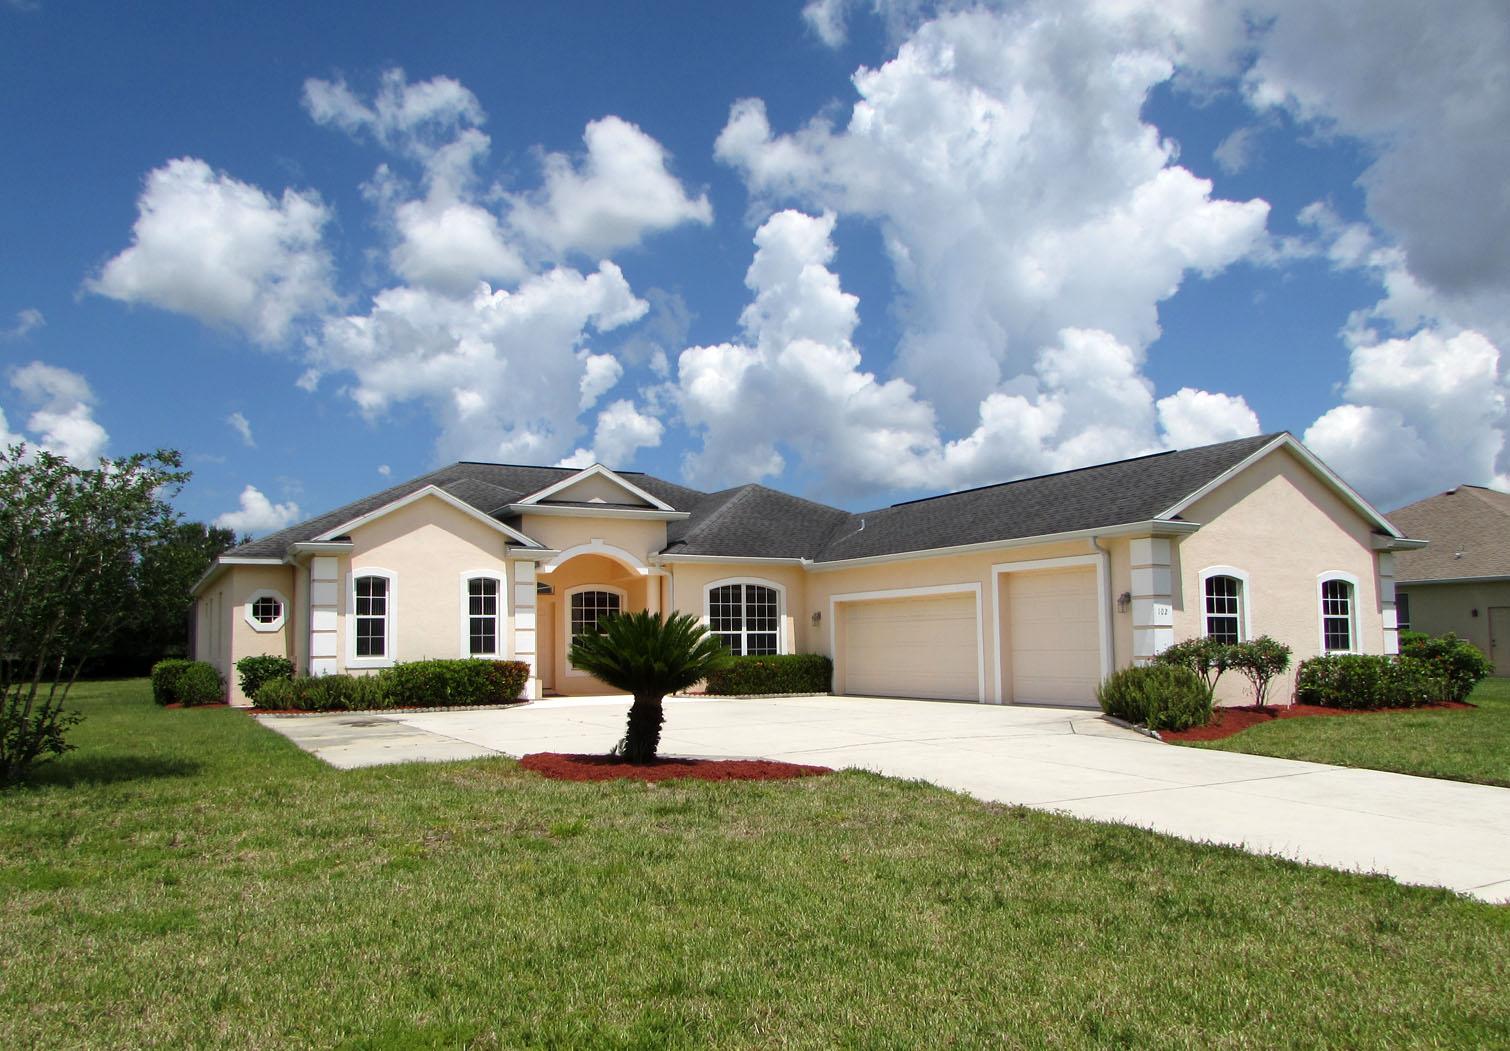 listings real estate is simple very spacious 4br 3ba 3car home